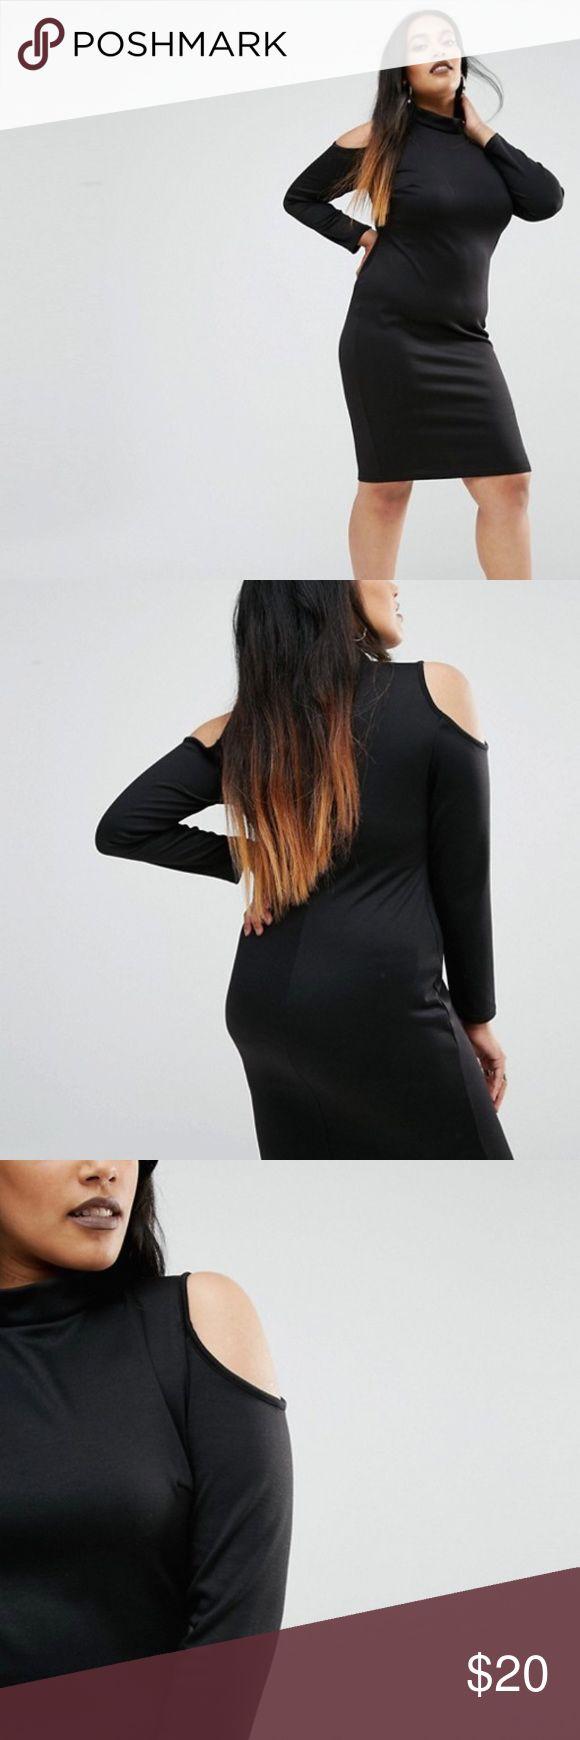 ASOS CURVE plus size black midi dress size 22 Adorable little black dress with cold shoulder detail. BRAND NEW NWT ASOS CURVE dress. Size 22. Hits right above knee. Very comfy. ASOS Curve Dresses Midi